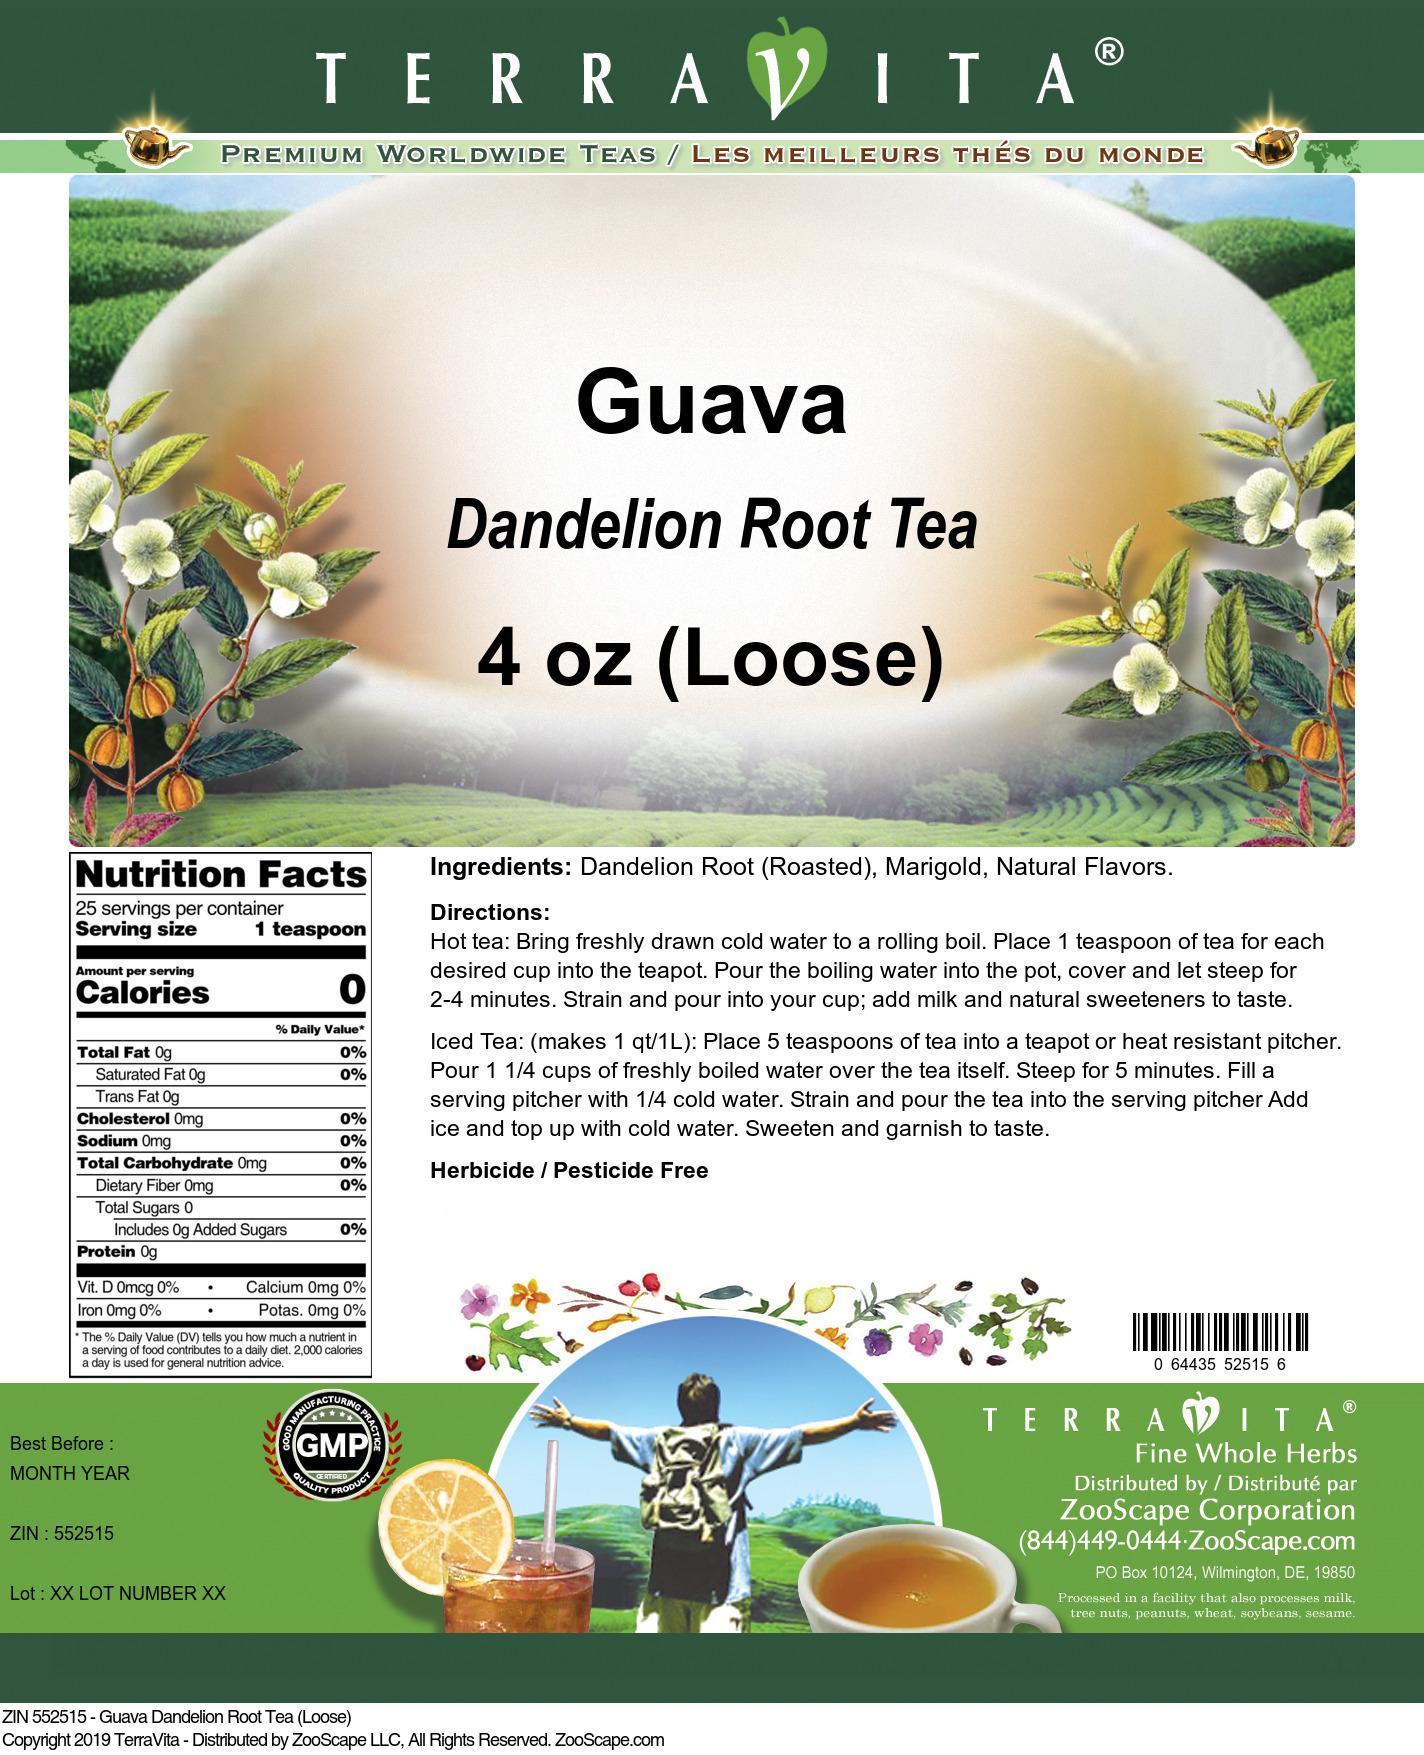 Guava Dandelion Root Tea (Loose)